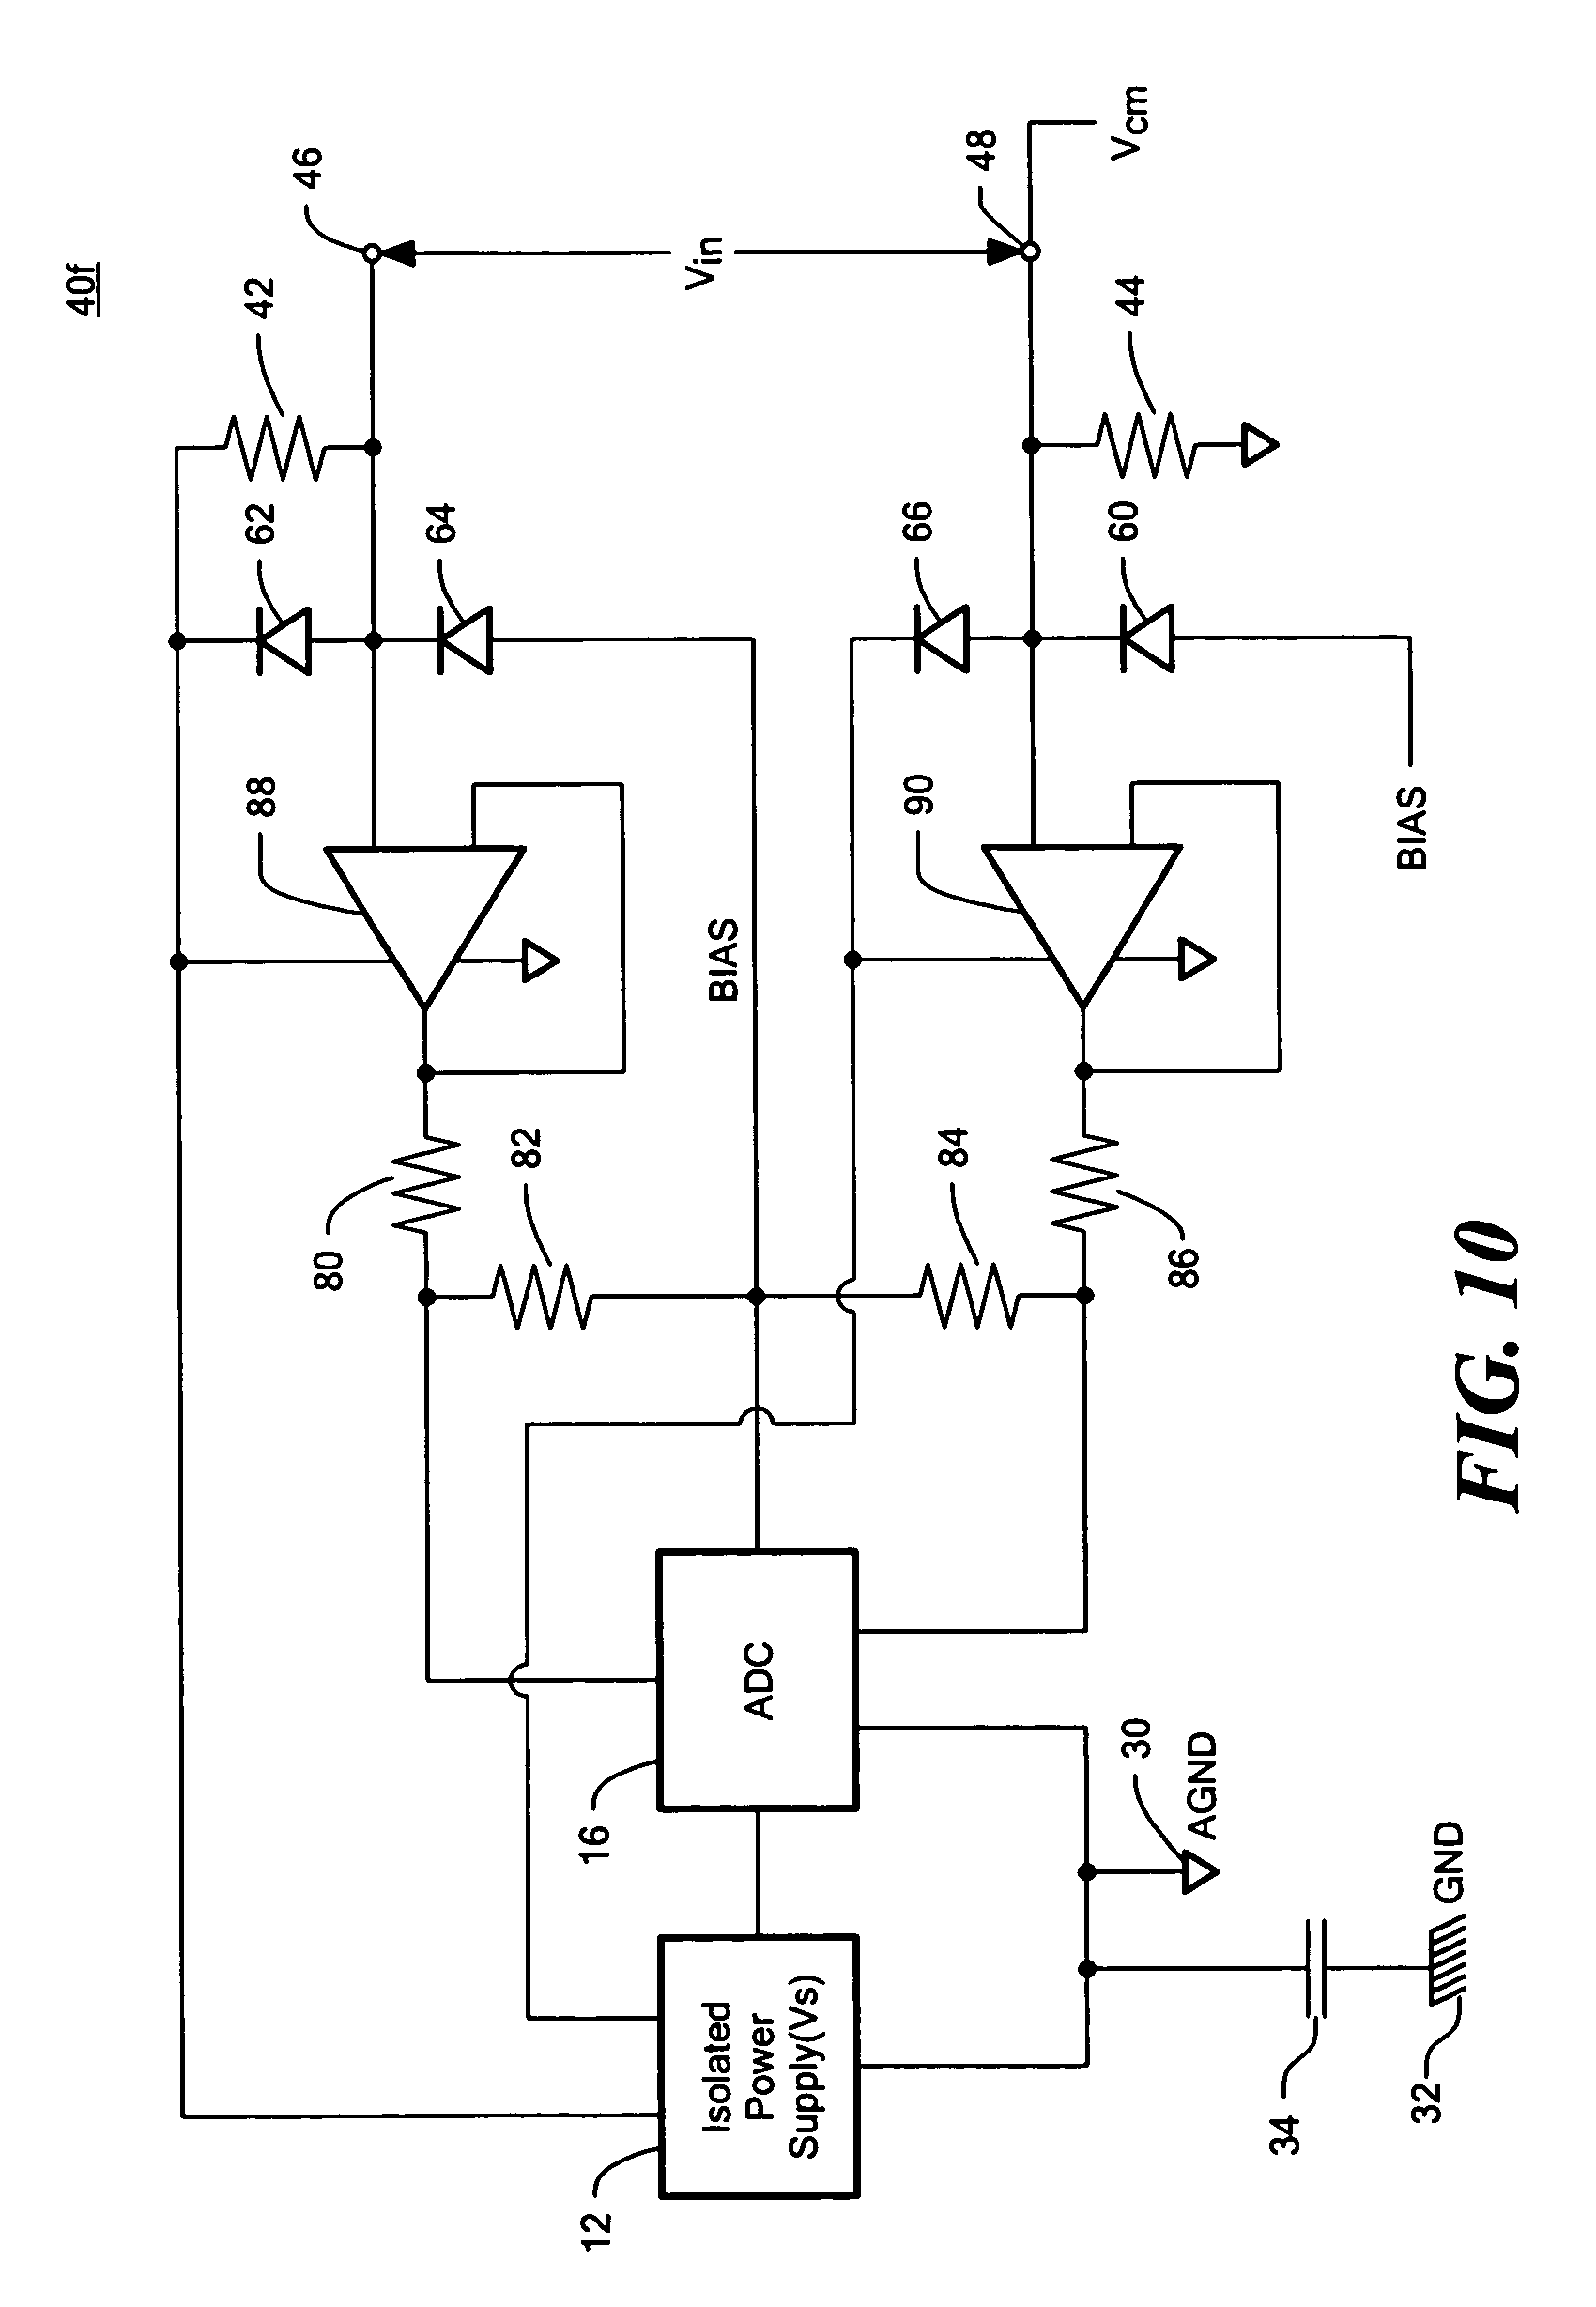 1756 ob16e wiring diagram